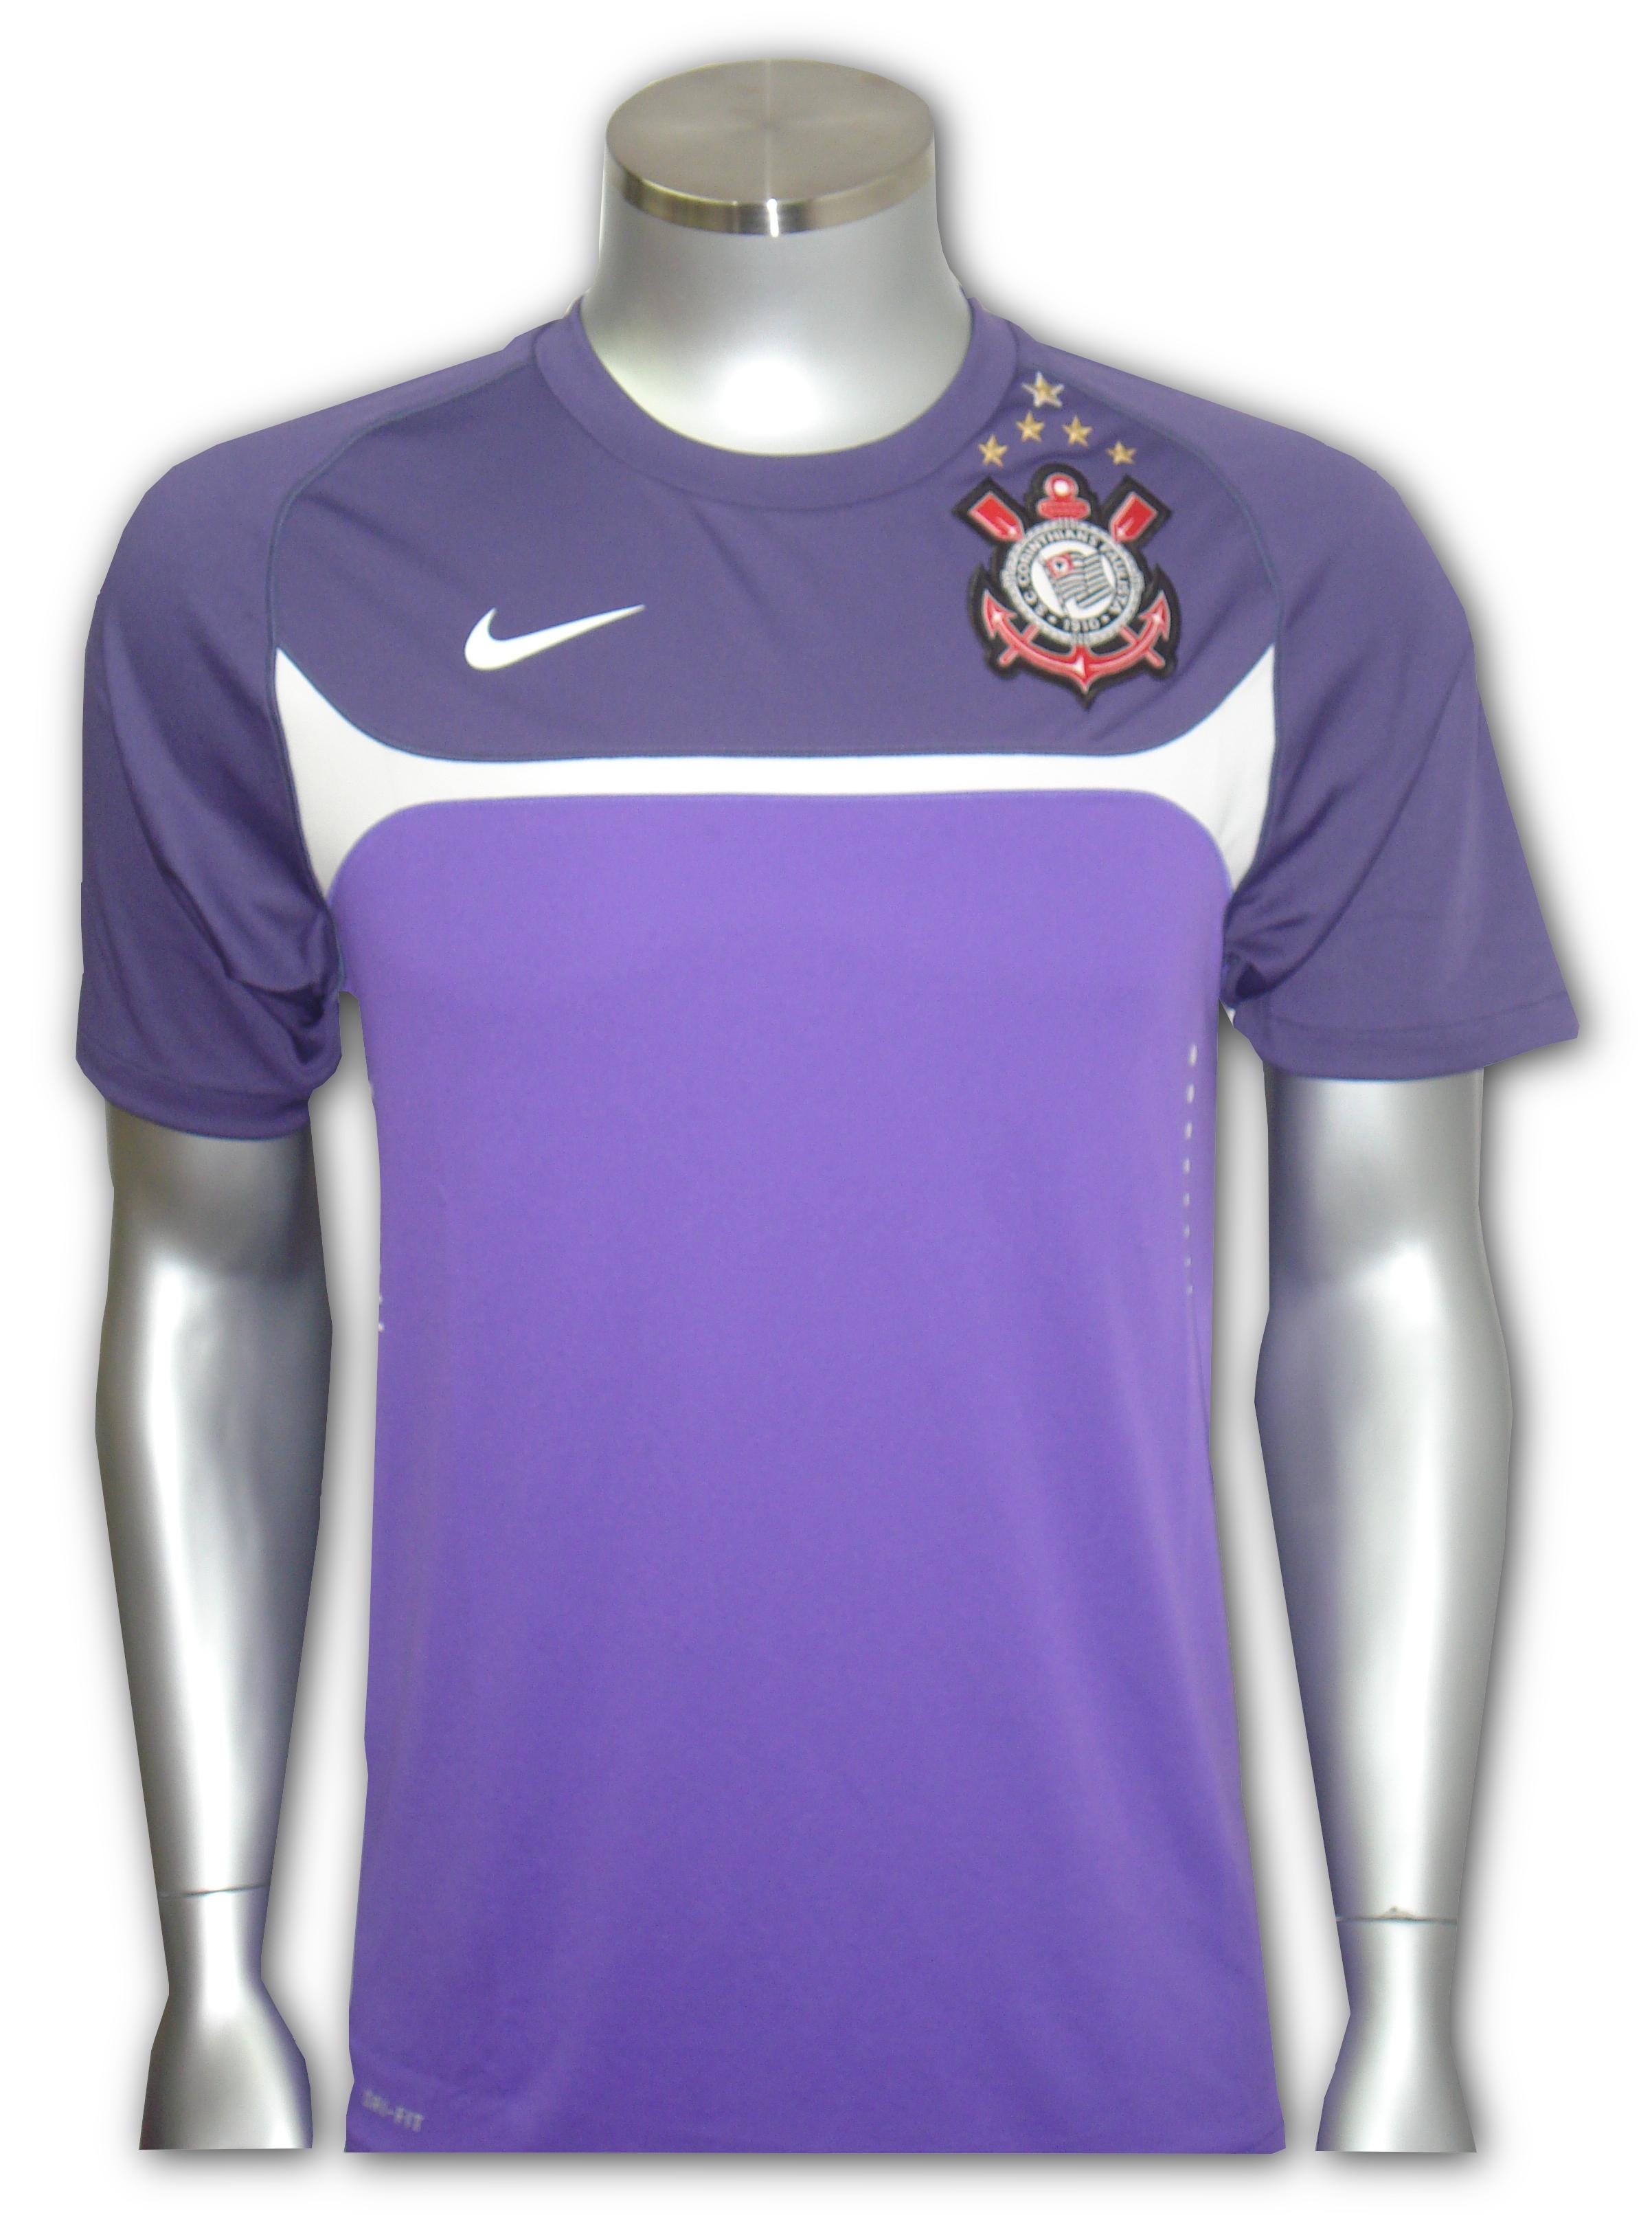 6e95d9c7506d5 Camisa Nike Treino Corinthians   Roxa Ref. 372934